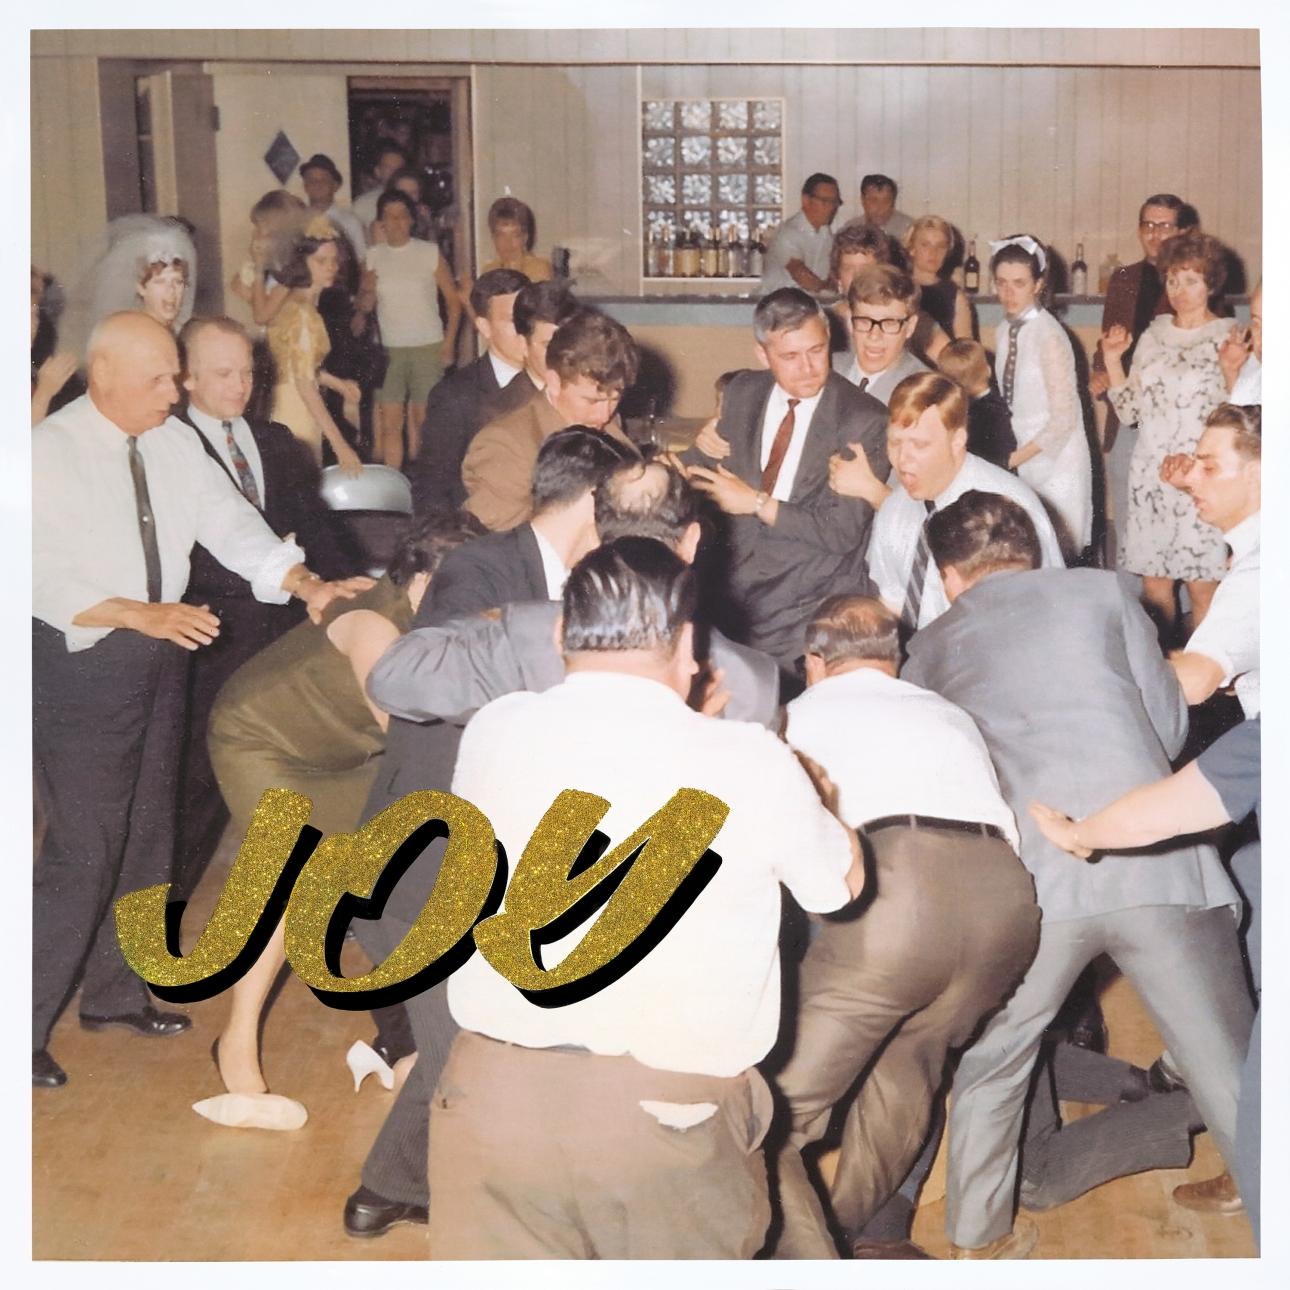 Resultado de imagen de idles joy as an act of resistance